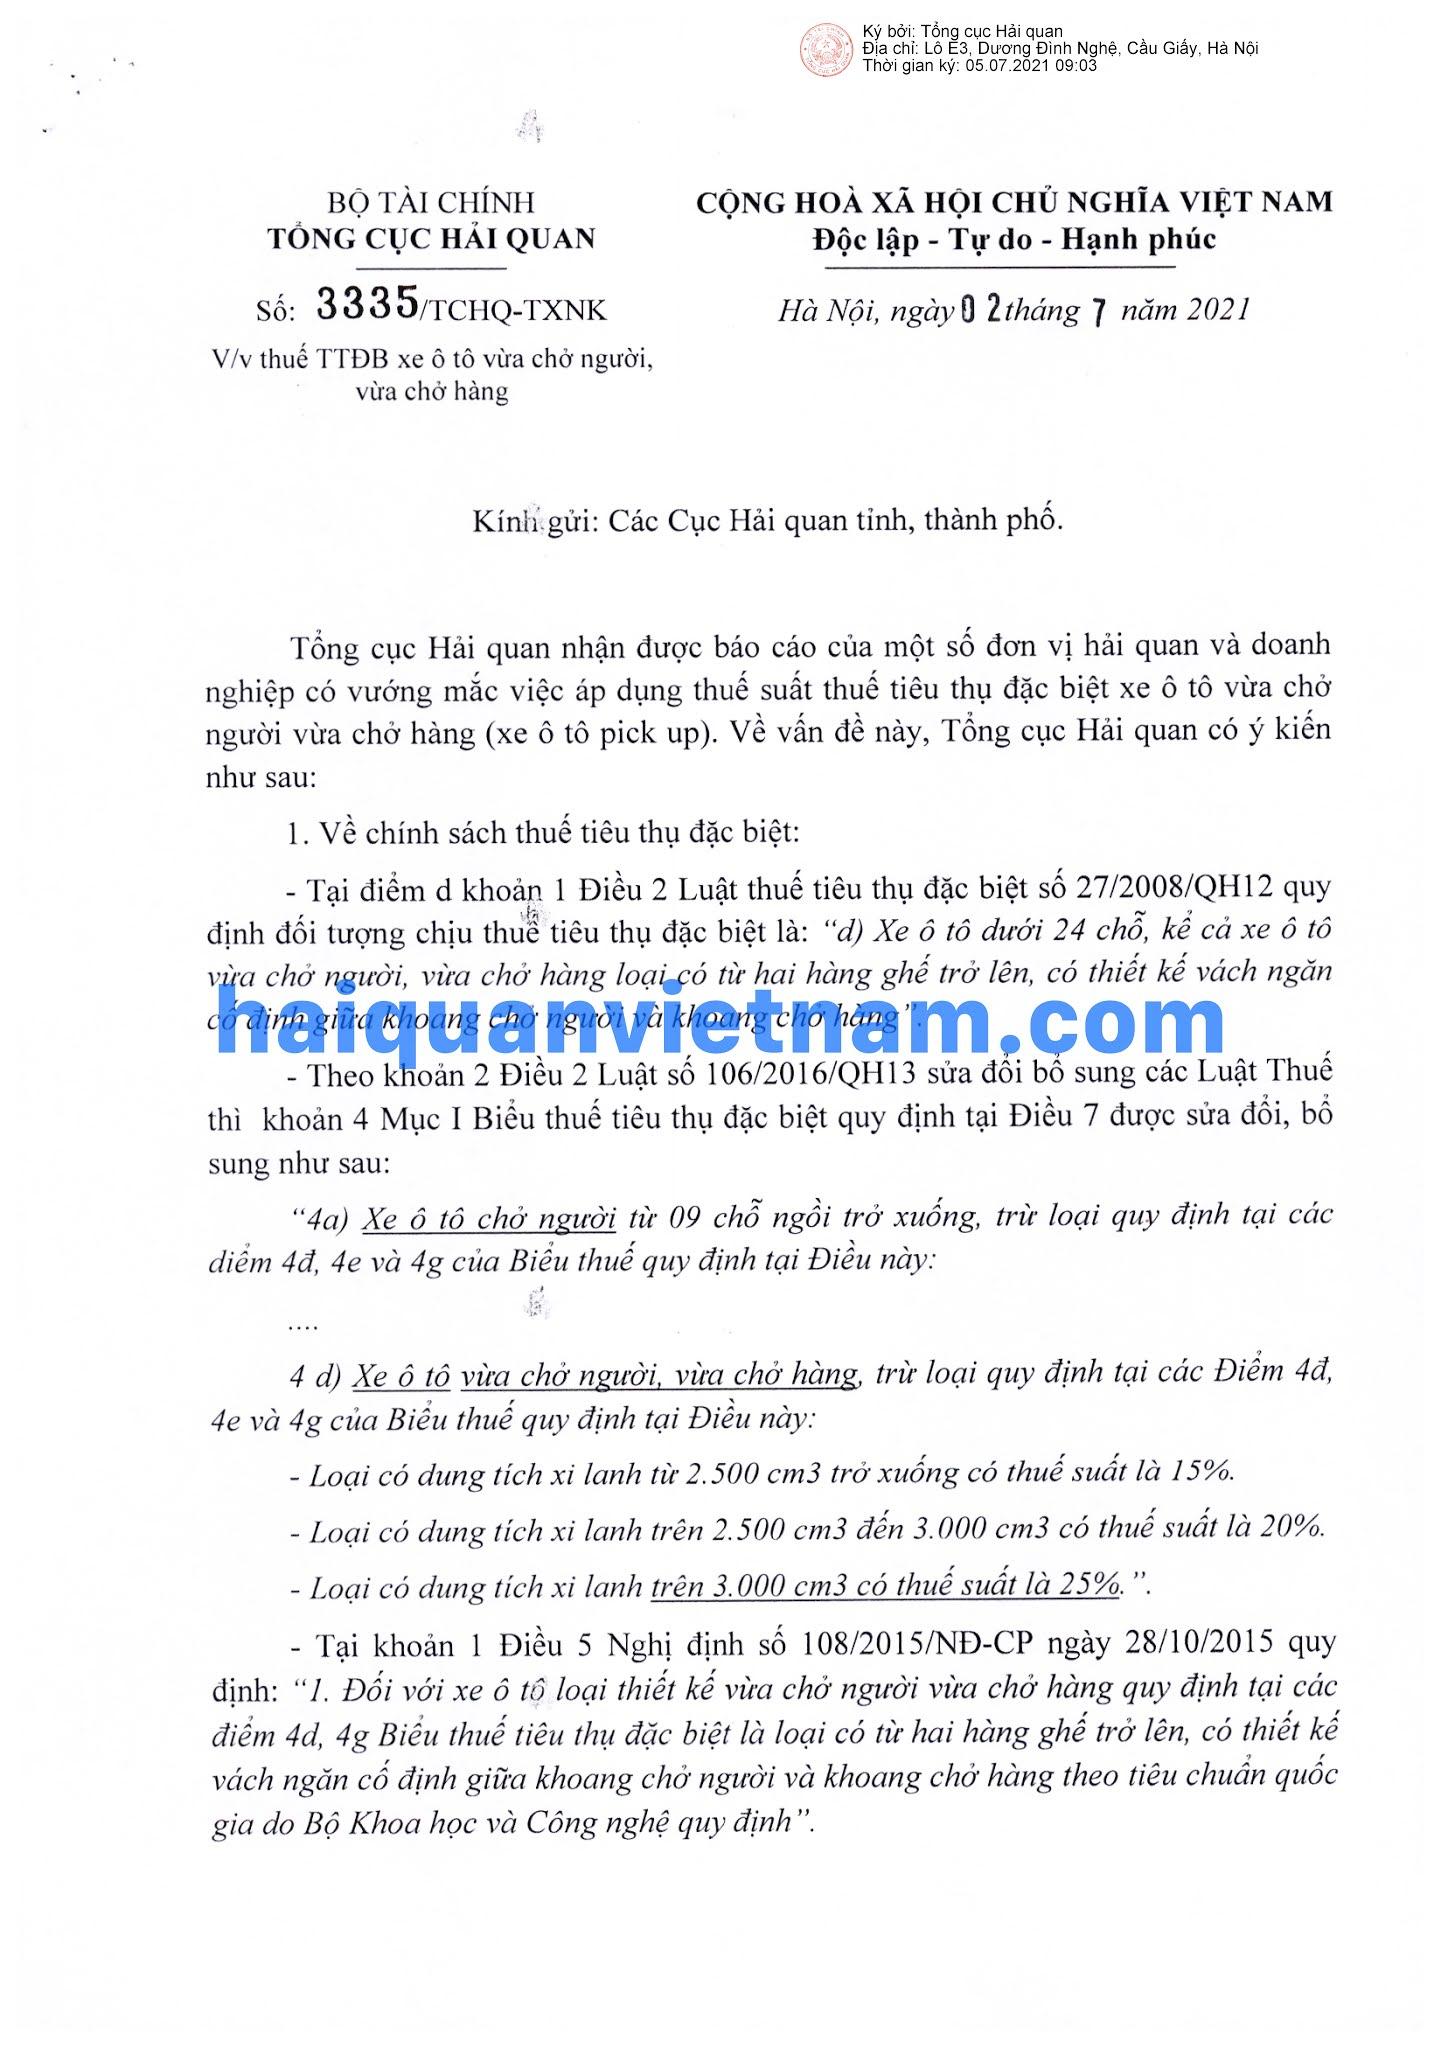 [Image: 210702-3335-TCHQ-TXNK_haiquanvietnam_01.jpg]